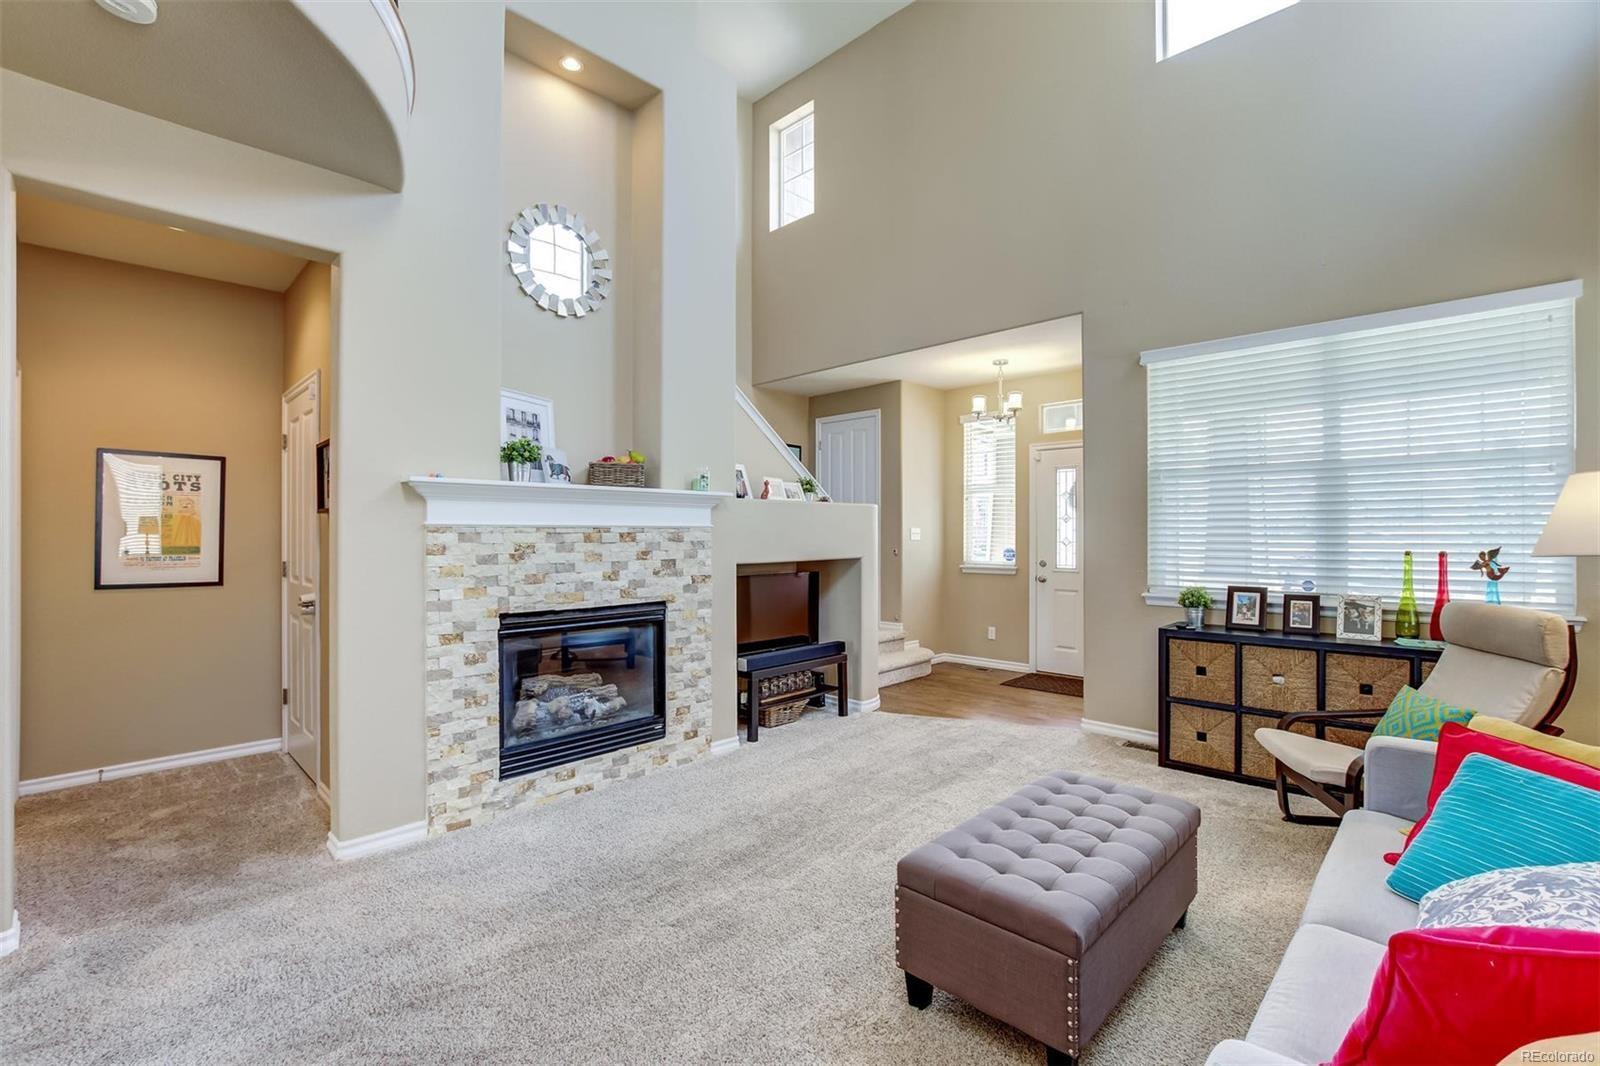 MLS# 7012343 - 1 - 5382  Cloverbrook Circle, Highlands Ranch, CO 80130